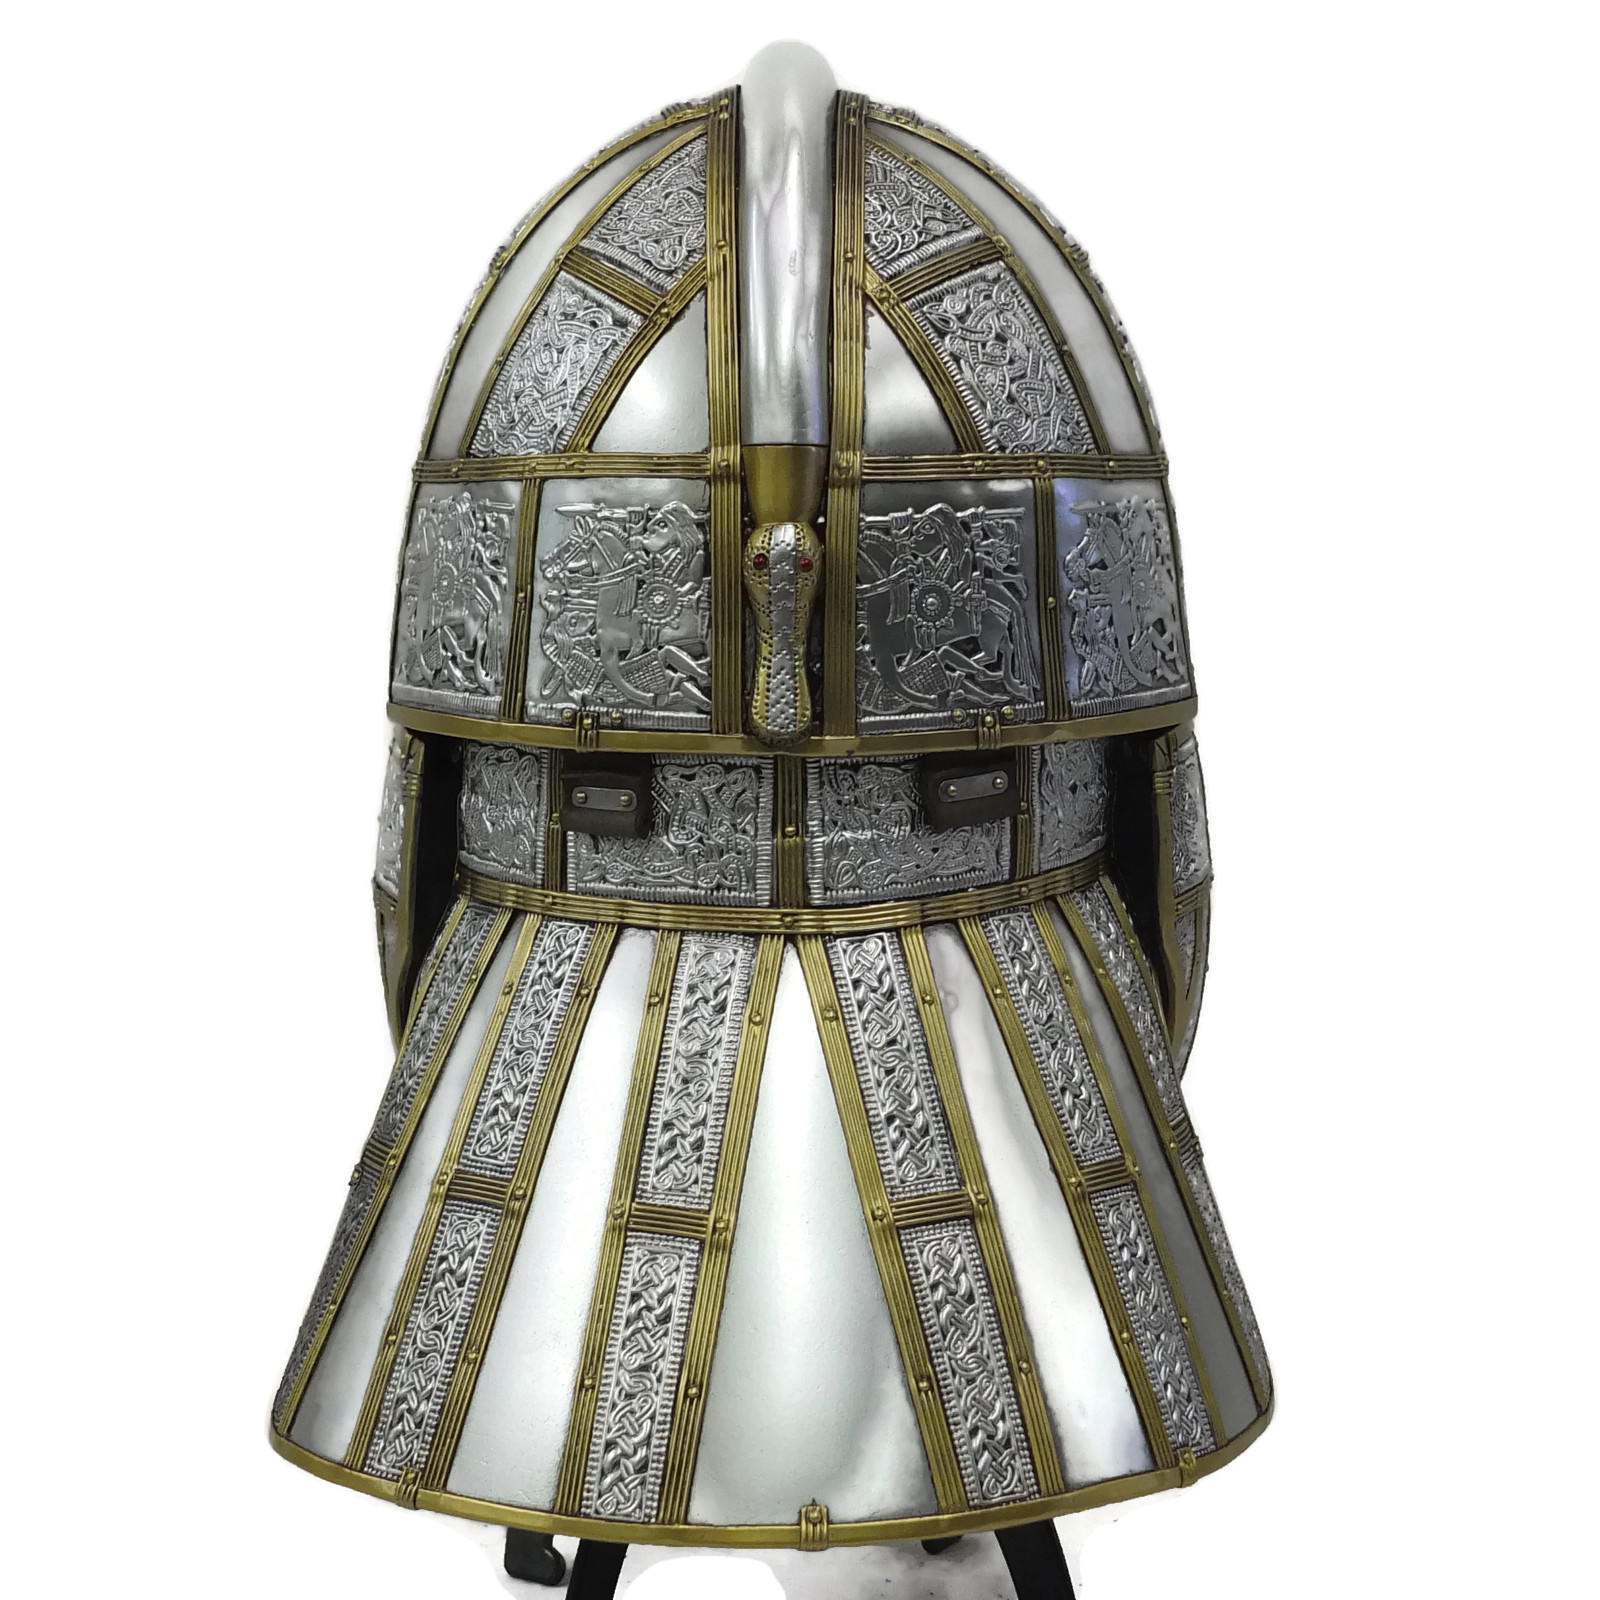 Larp armour sutton hoo helmet - Hoo showroom ...